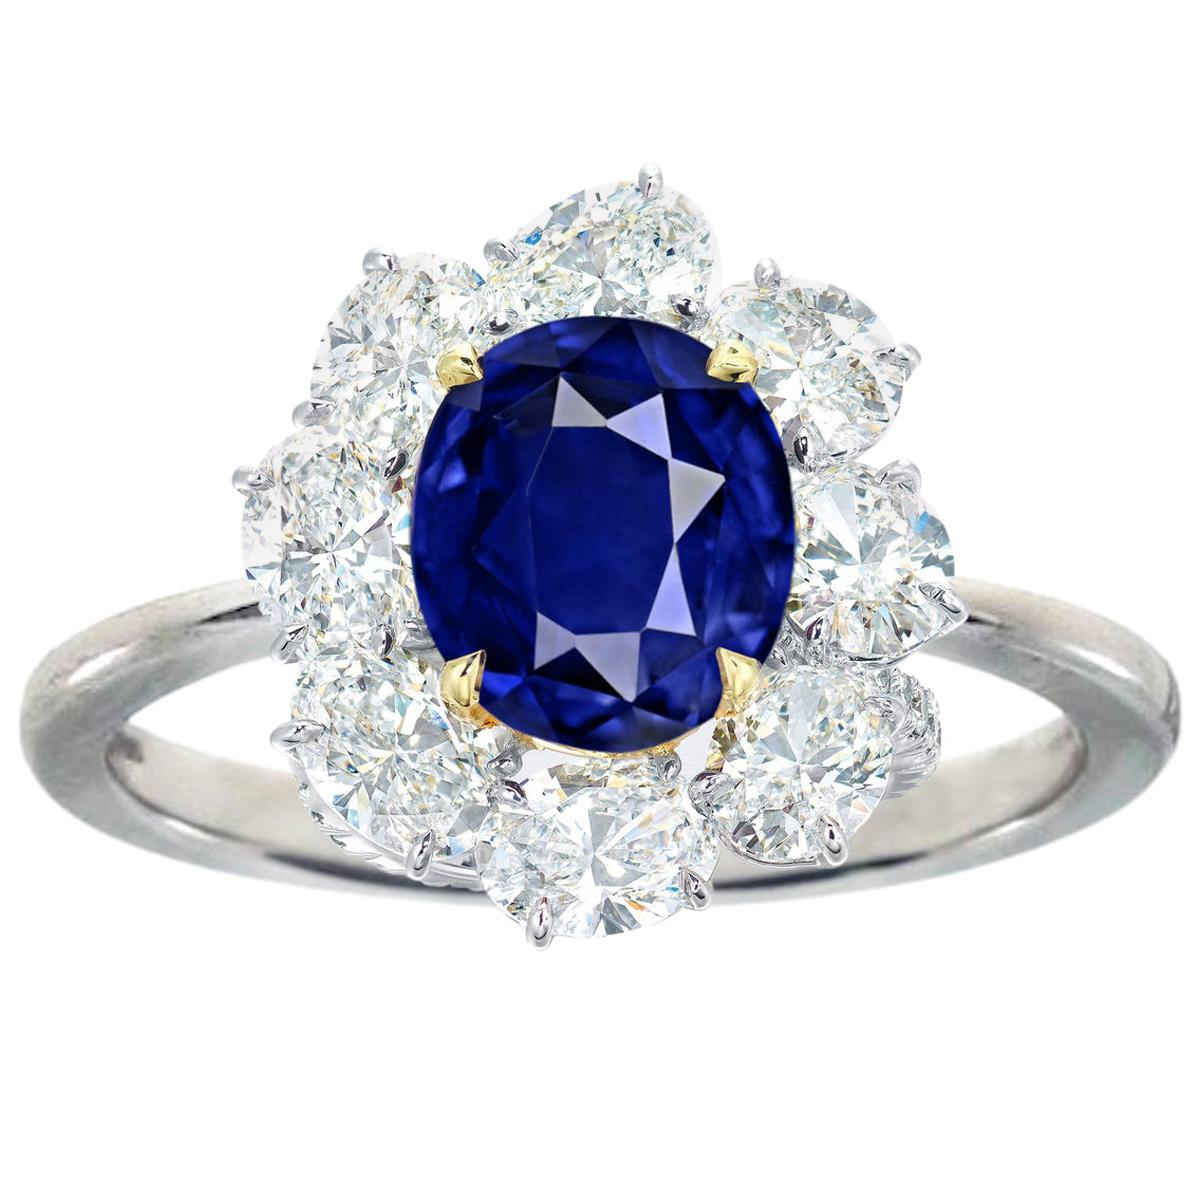 GRS Switzerland Royal Vivid Blue 3.80 Carat Oval Sapphire Diamond Cocktail Ring